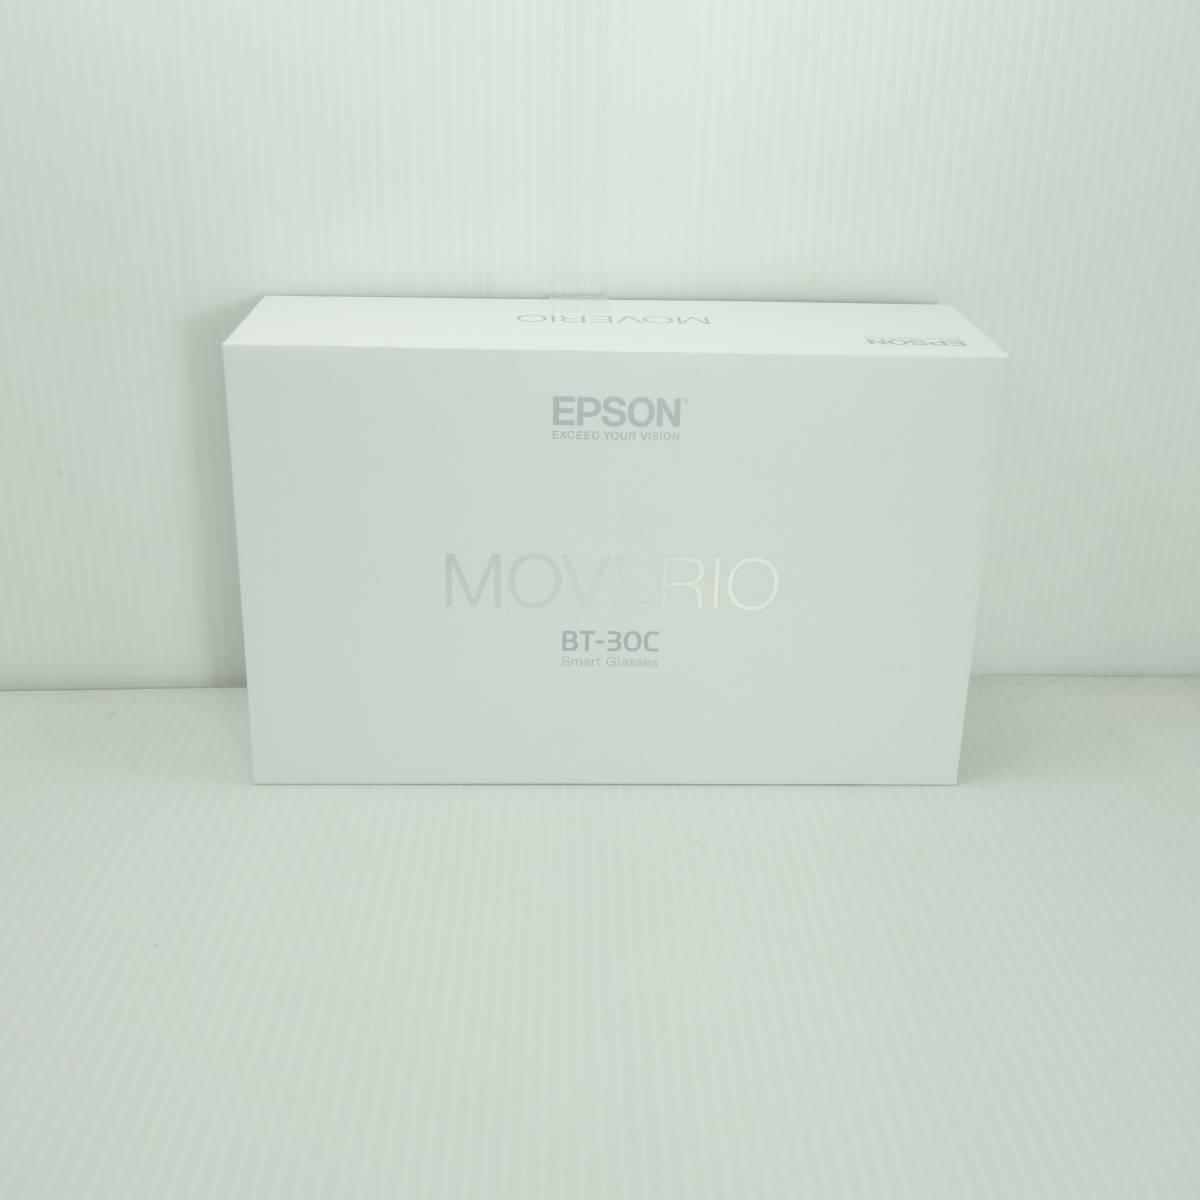 EPSON MOVERIO BT-30C モベリオ/スマートグラス 2019/05/30発売